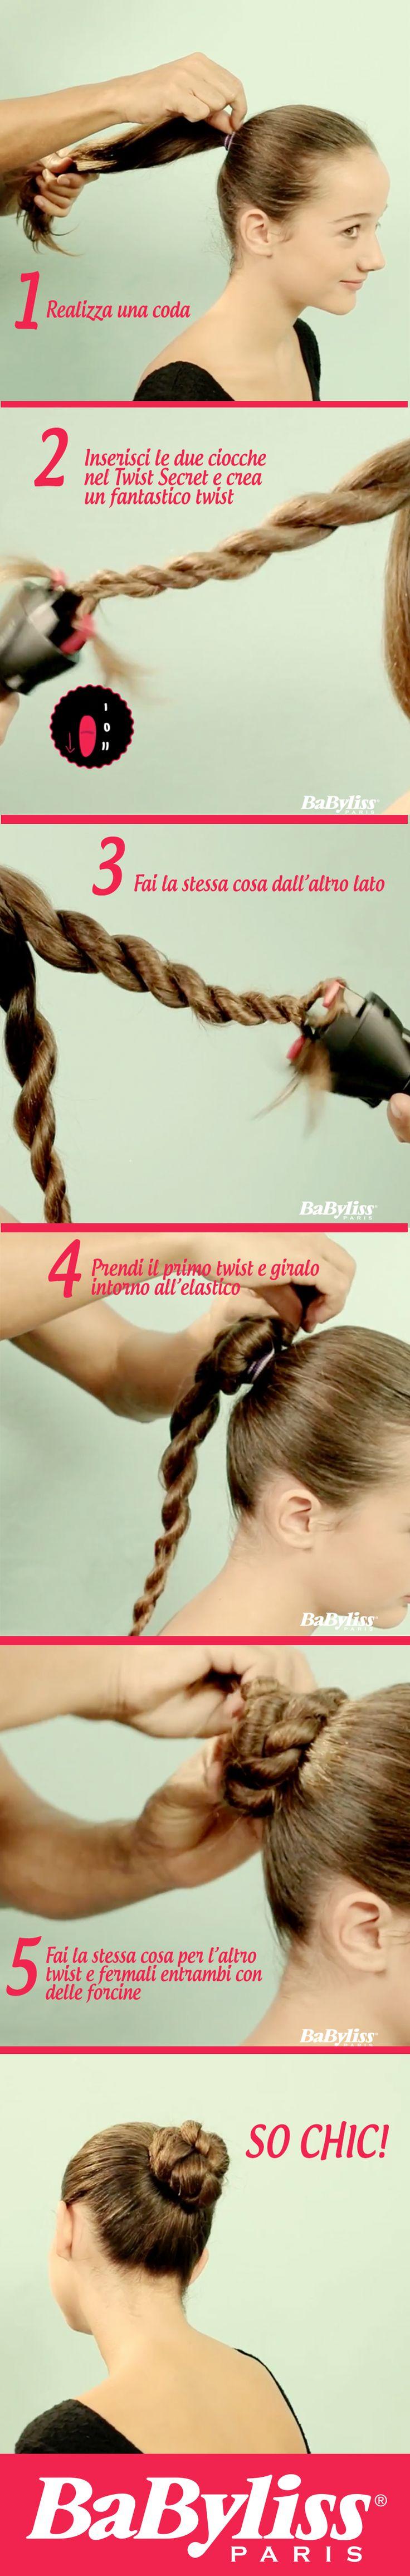 #tutorial #braid #braids #treccia #trecce #acconciatura #acconciature